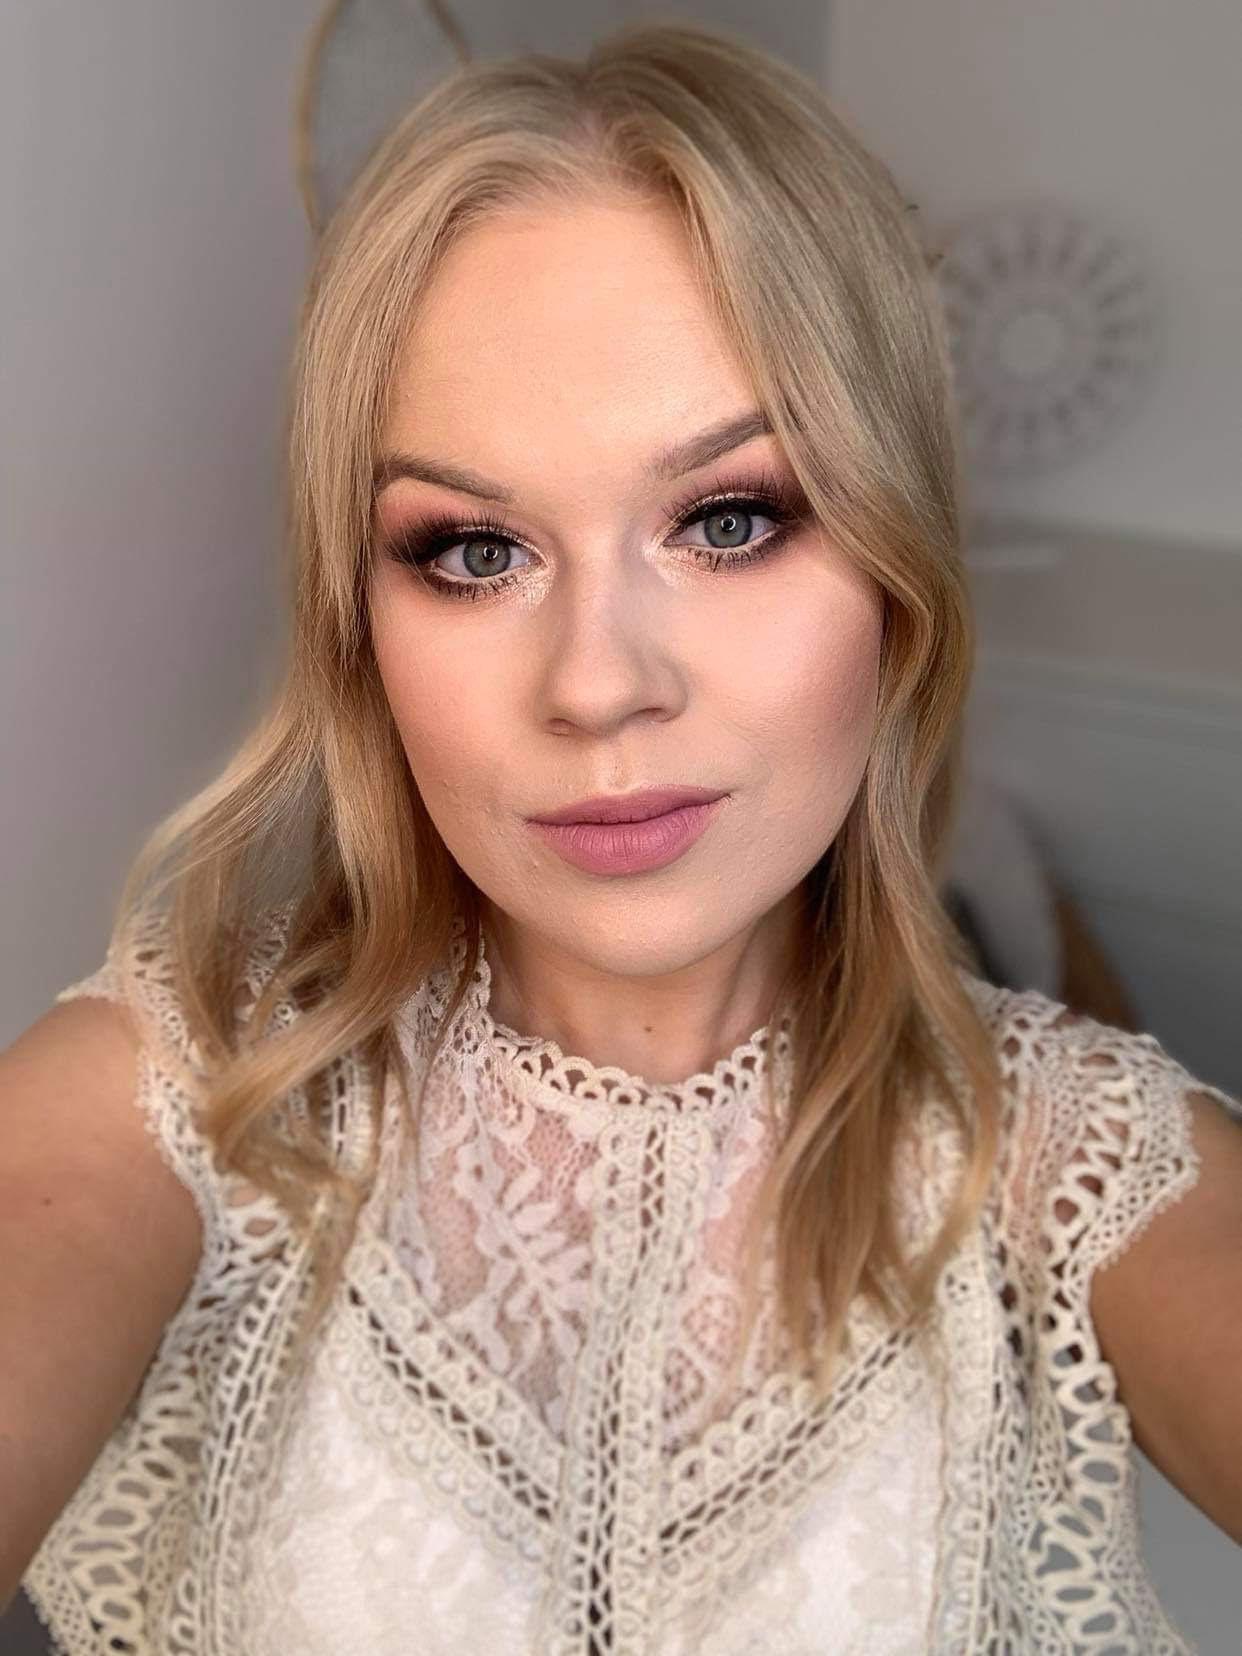 Agata Rybak